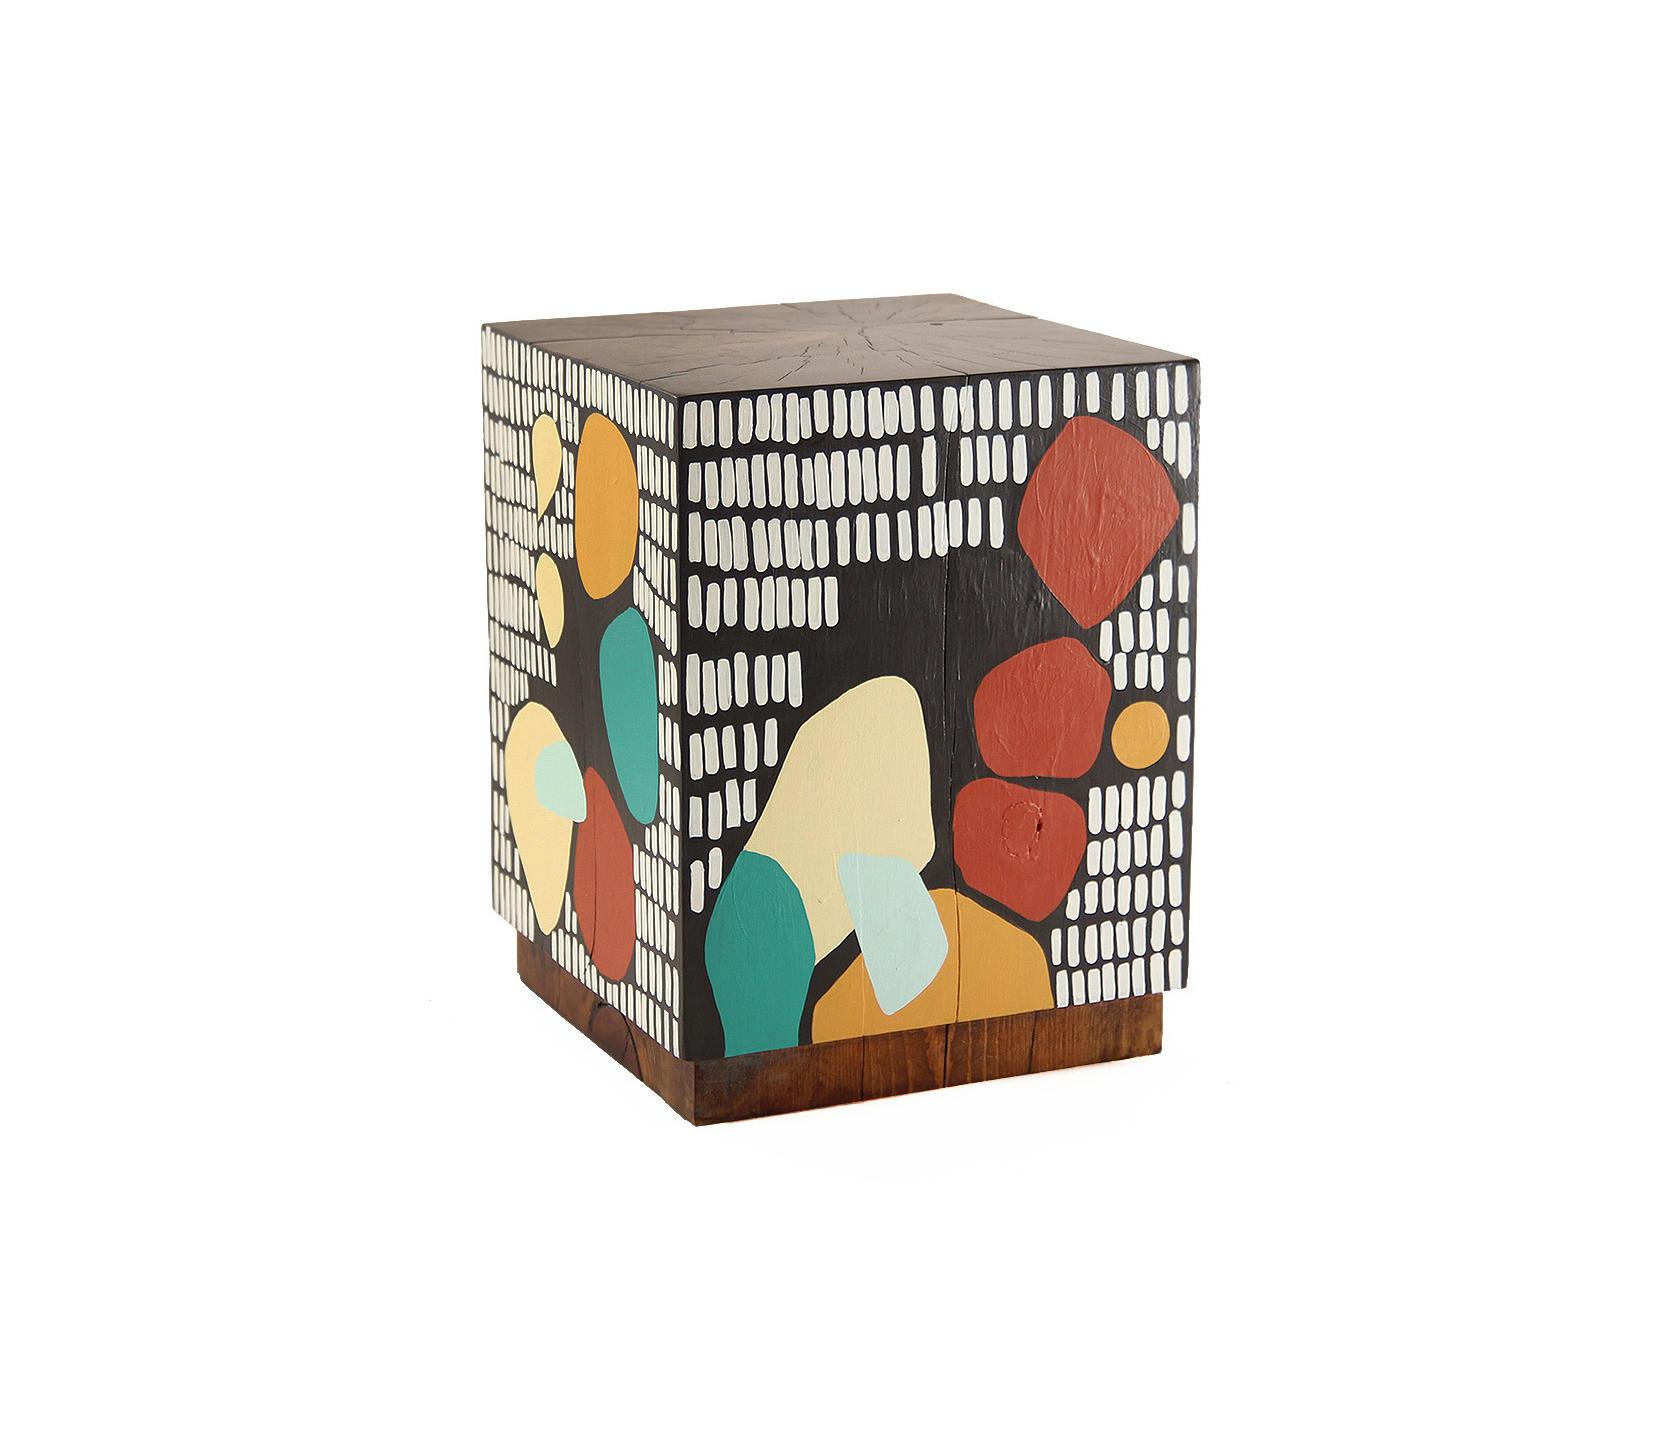 Banda Baako Hand Painted Cube Architonic